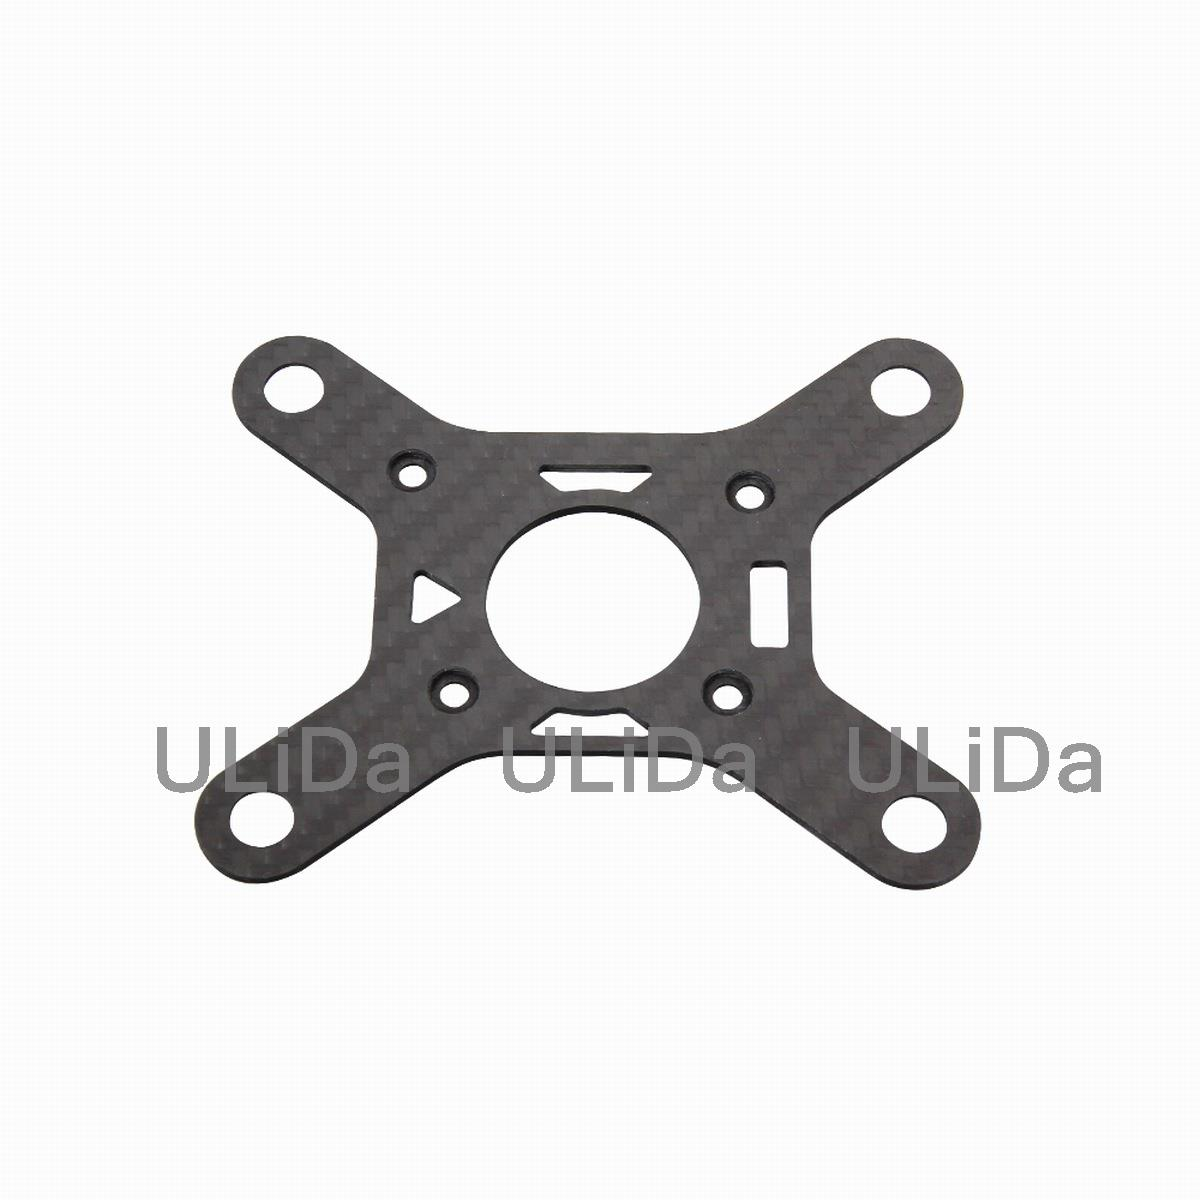 DJI P3A//P Screw Set Rubber for Phantom 3 Professional//Advanced RC Drone Part